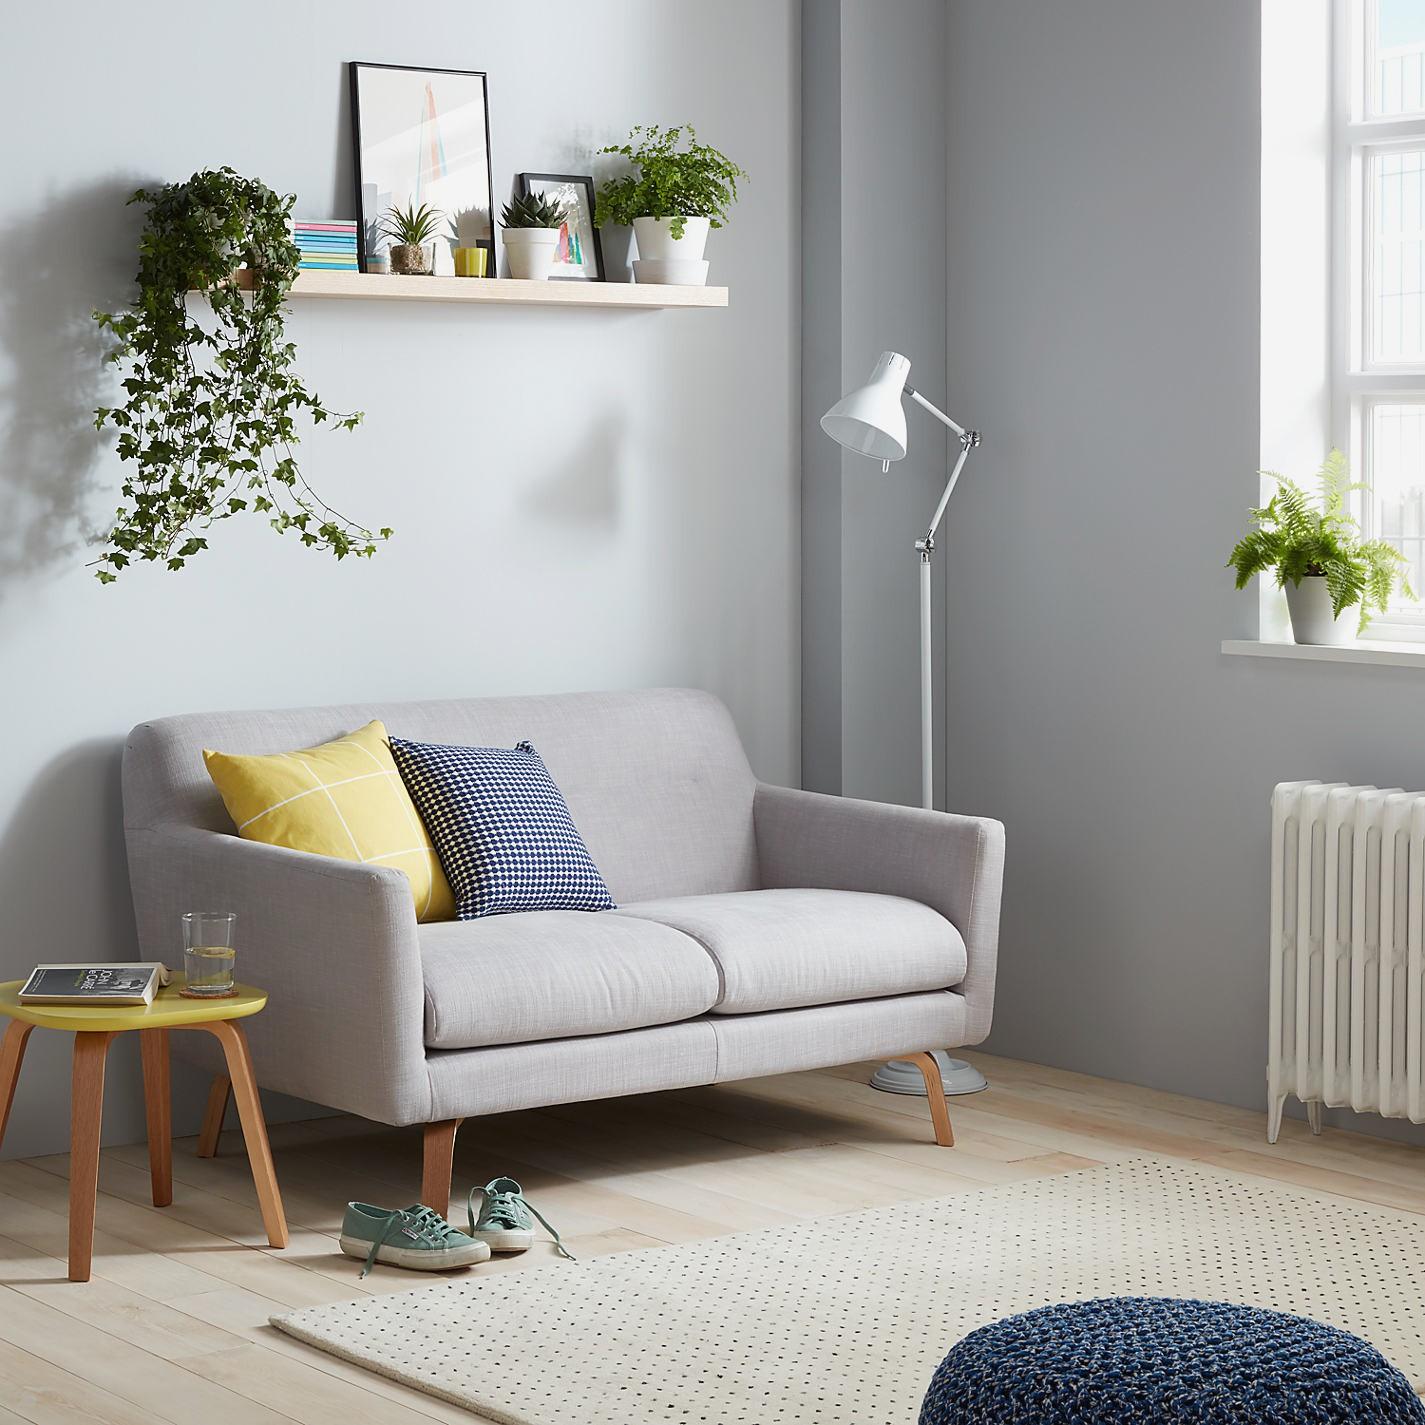 john lewis living room designs photo - 4